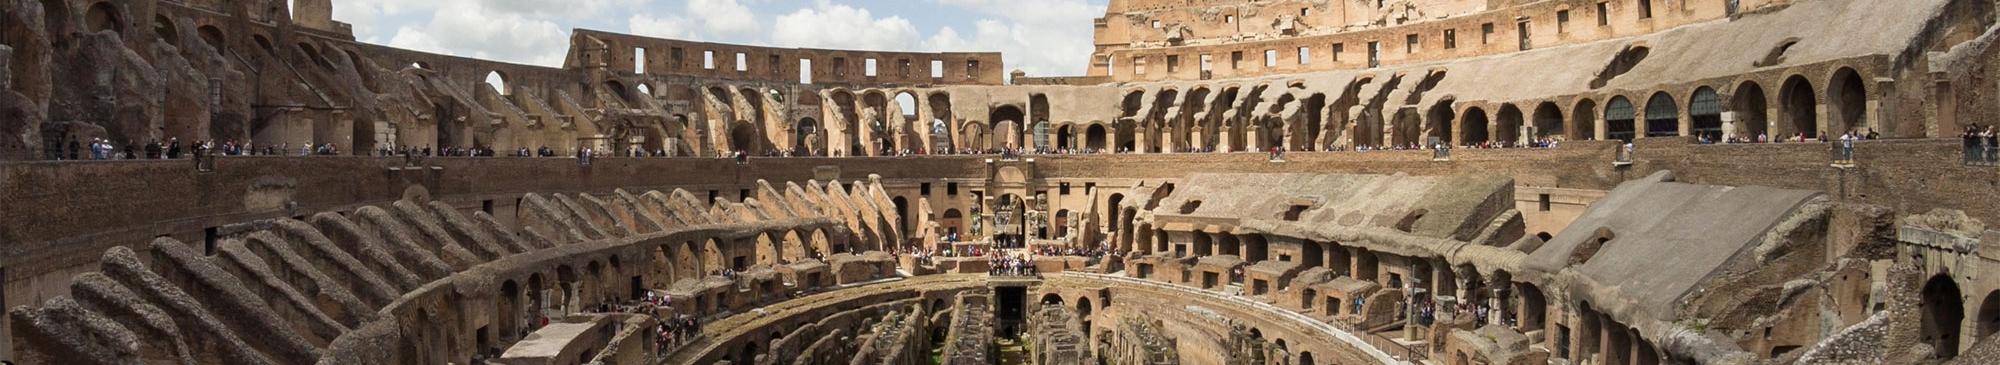 Declinare Roma_Sapienza_ateliercrilo.com_1.jpg